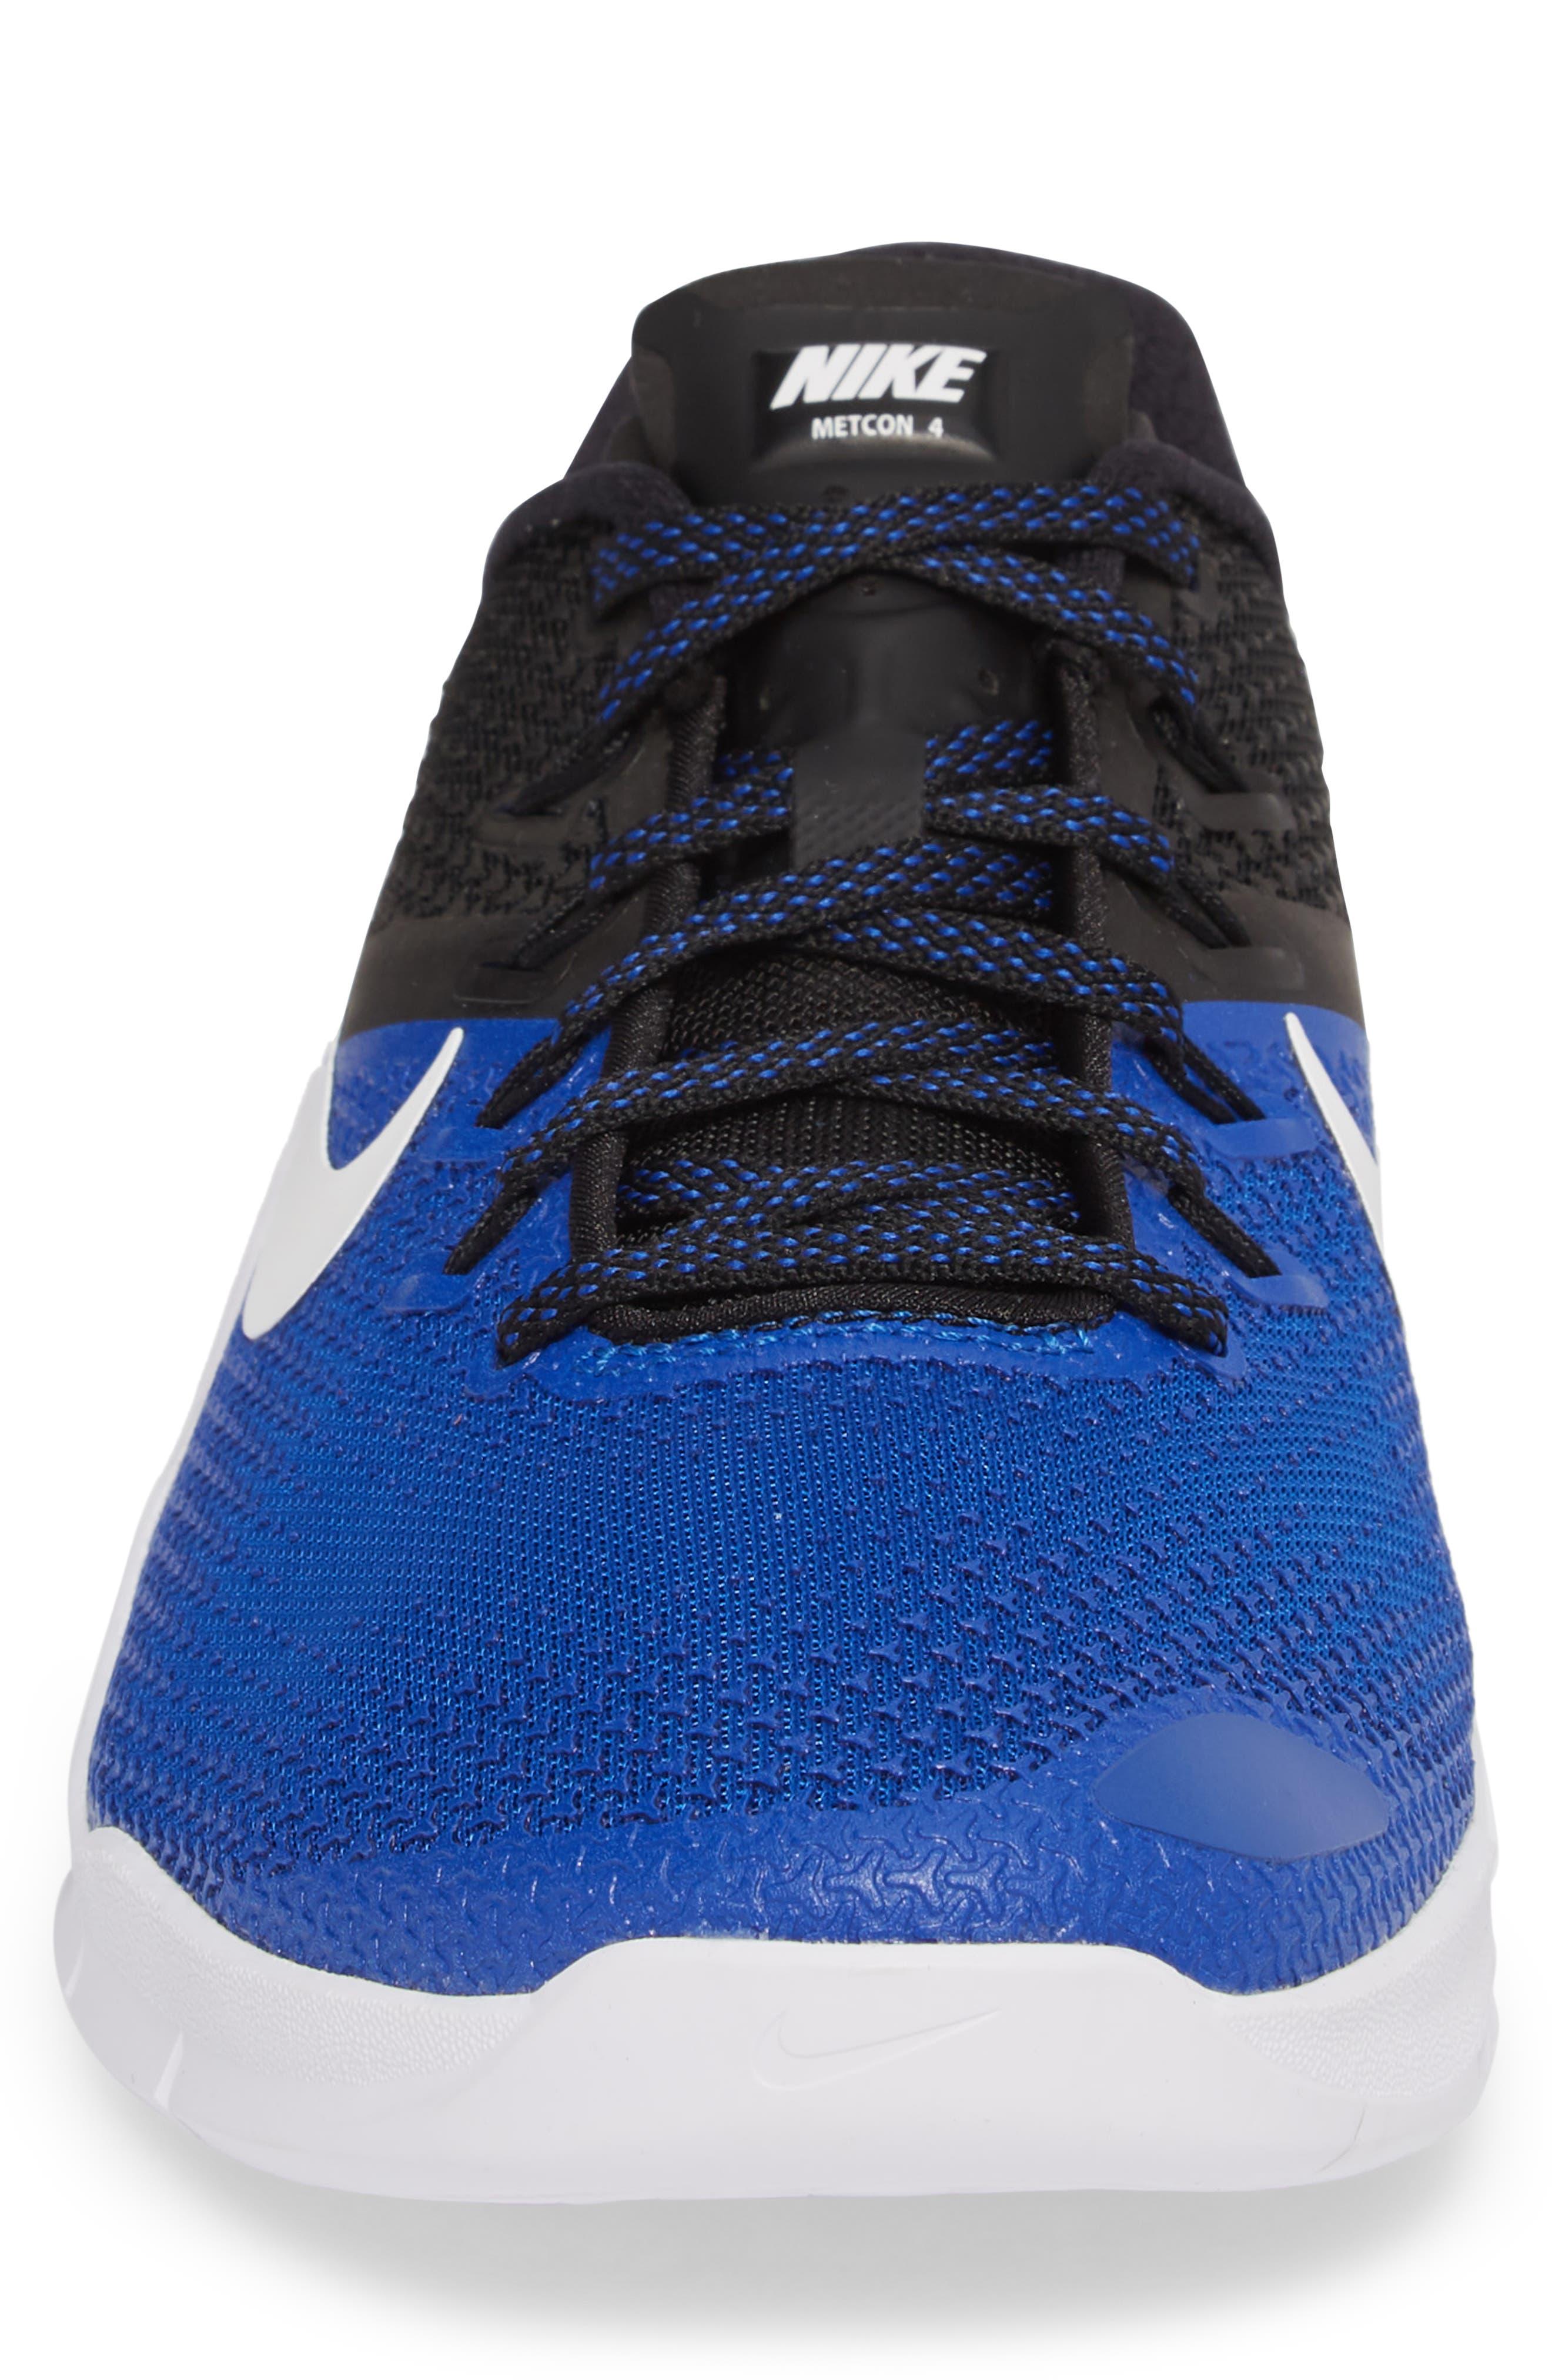 Metcon 4 Training Shoe,                             Alternate thumbnail 4, color,                             410